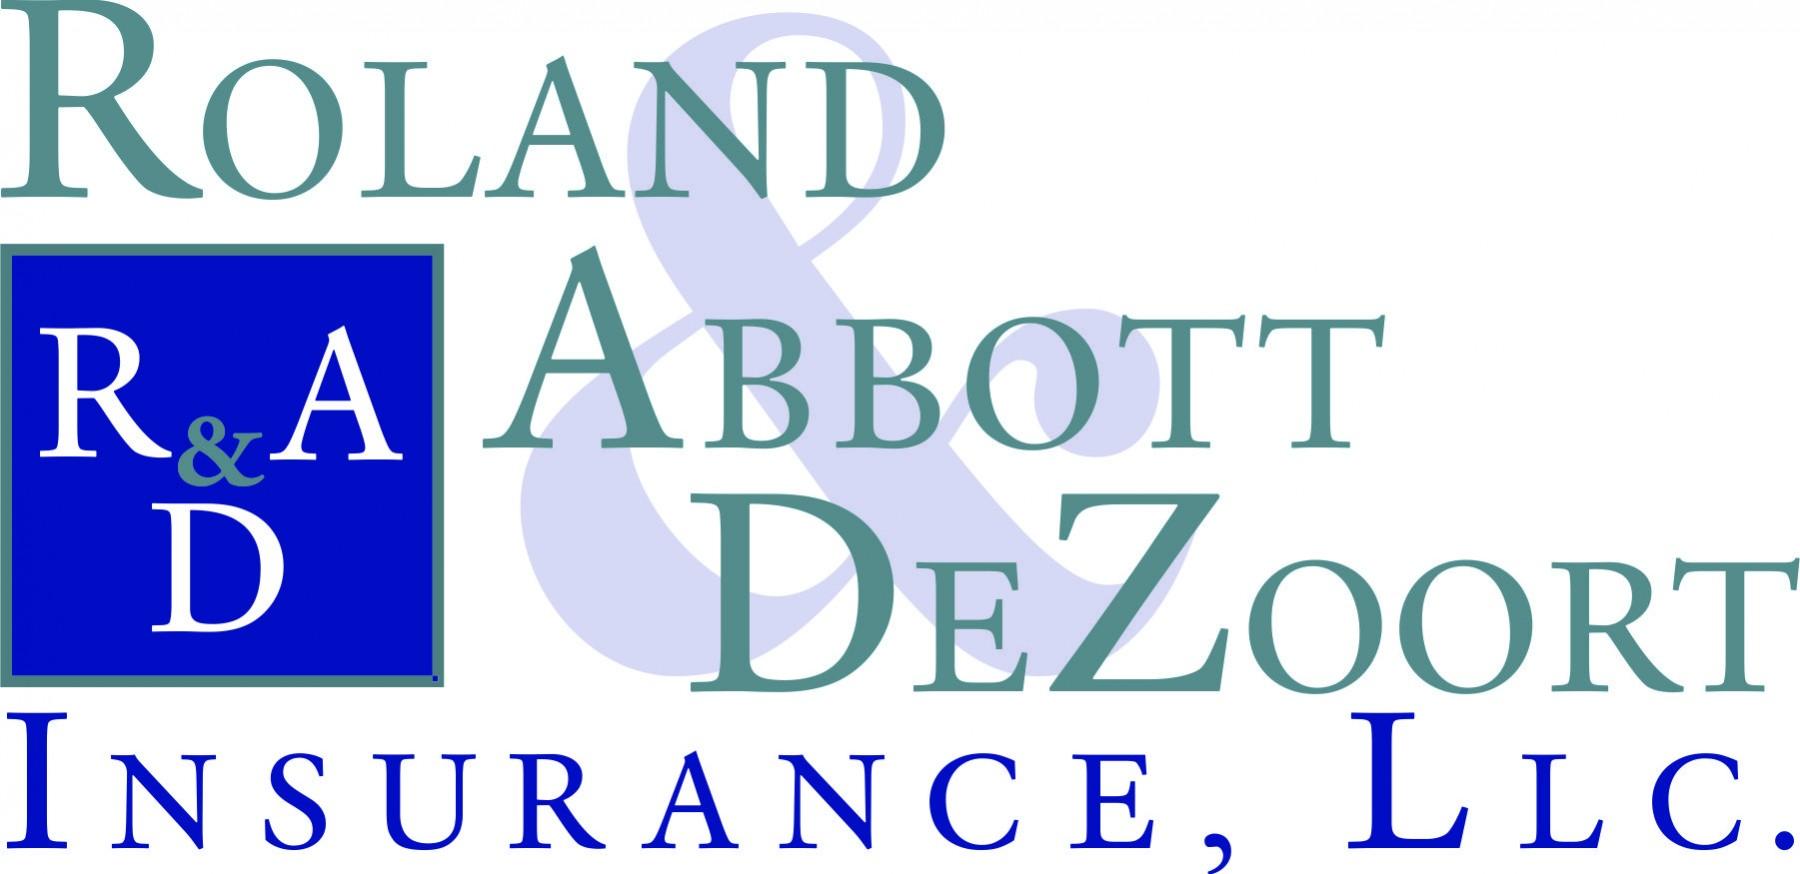 Roland, Abbott, & DeZoort Insurance